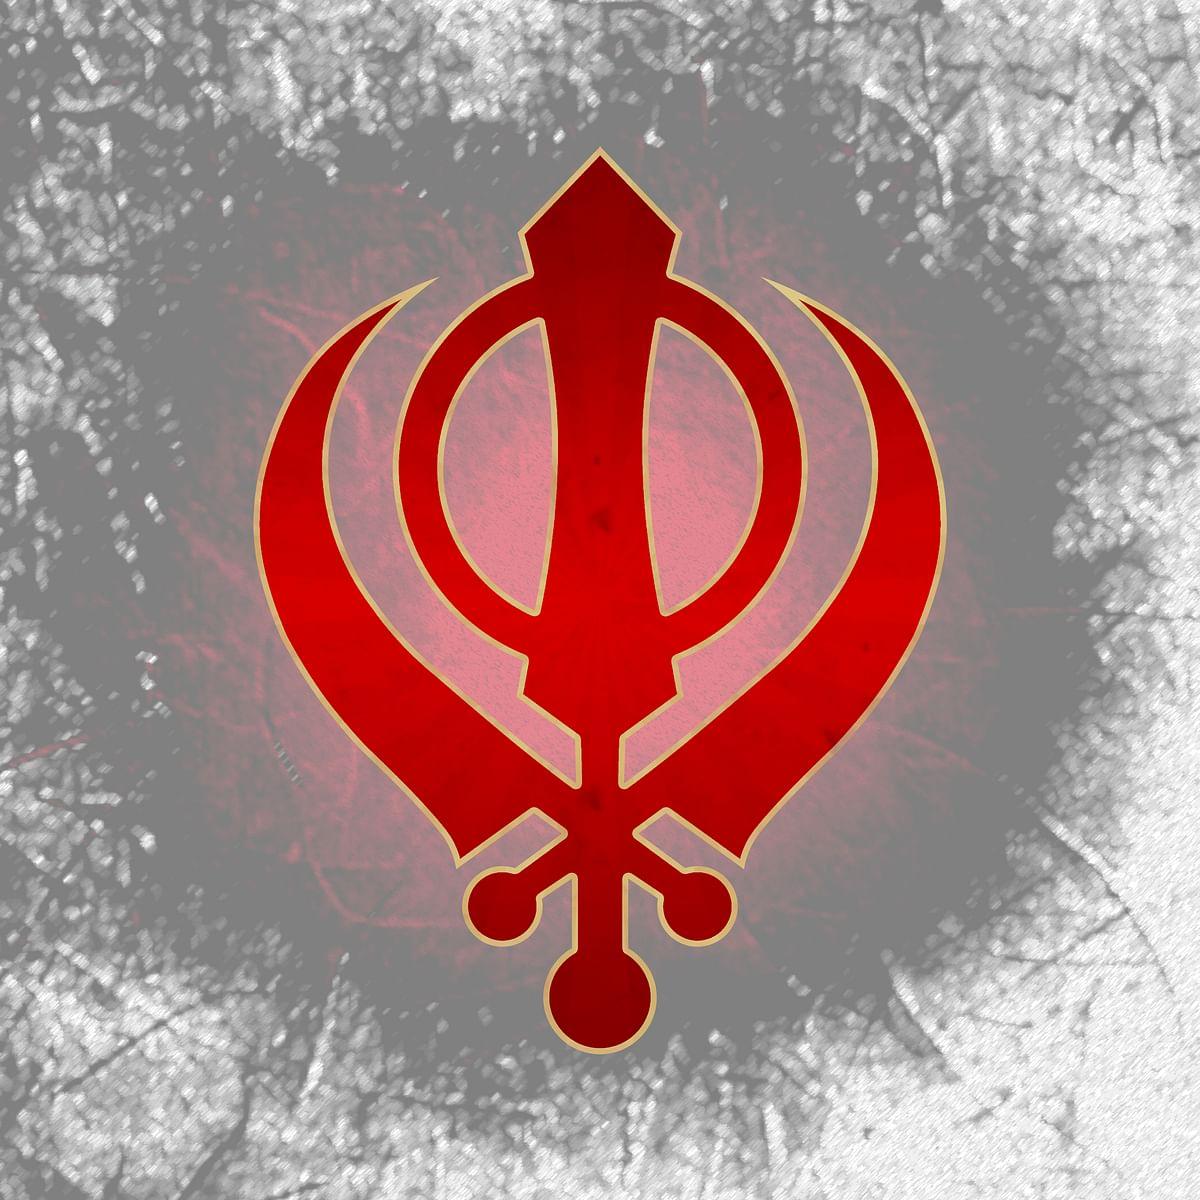 गुरू राम दास जी - Sikh Guru Ramdas Ji in Hindi